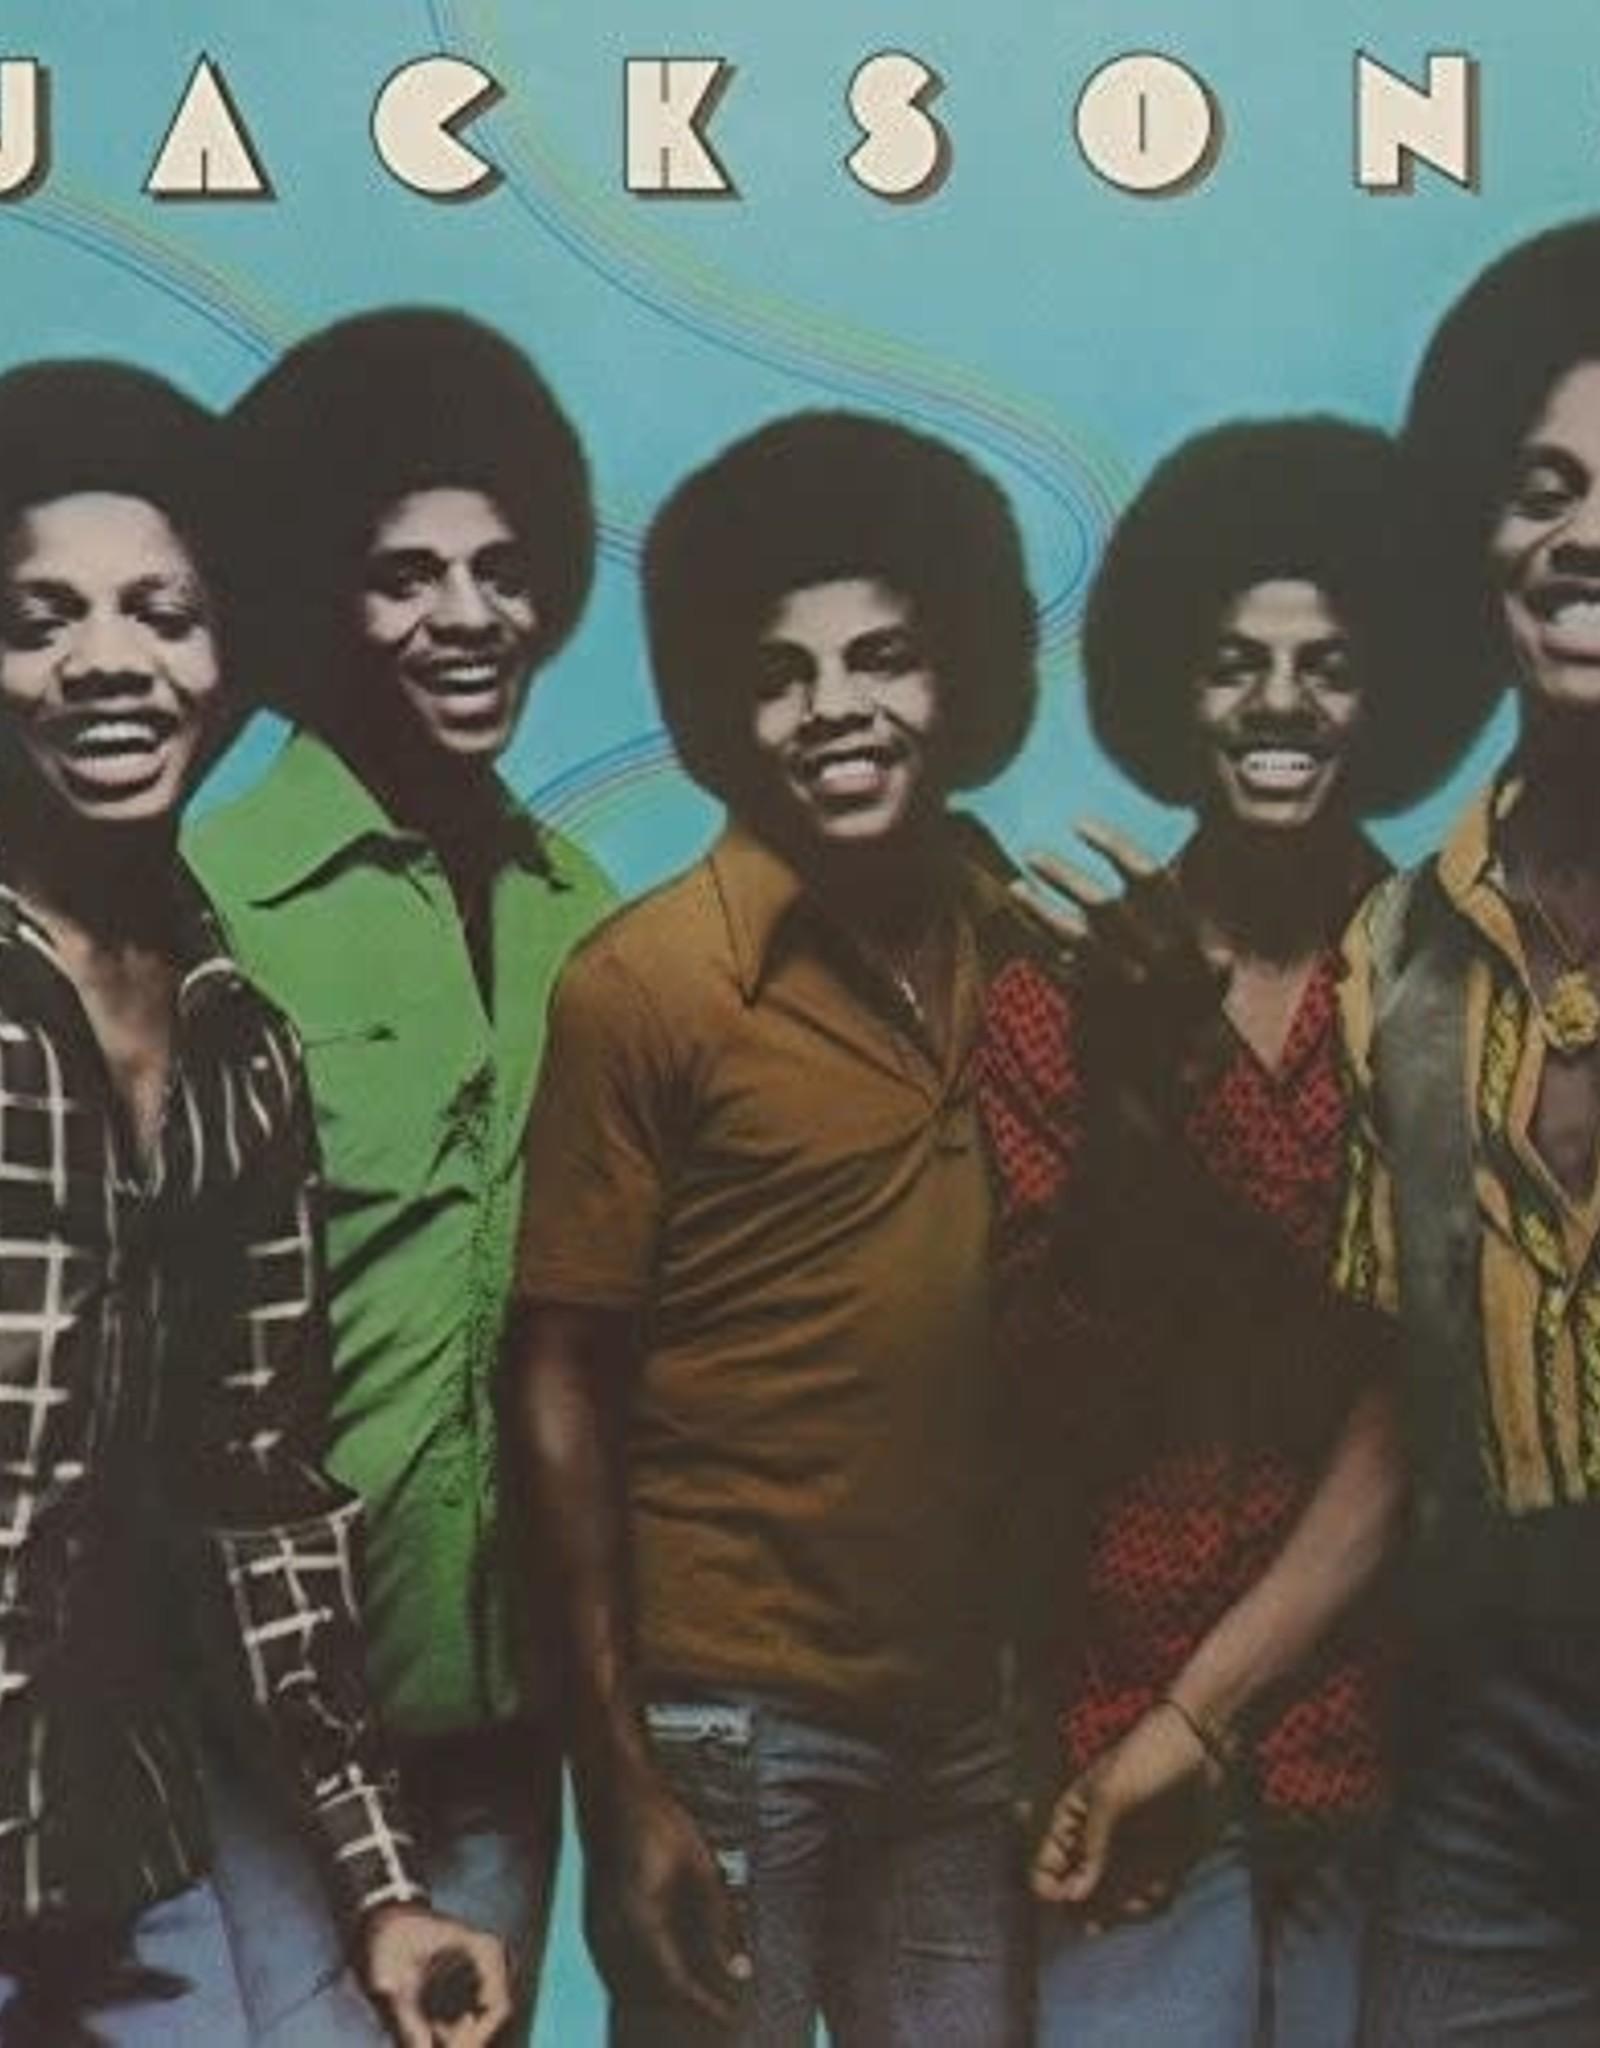 The Jacksons - The Jacksons